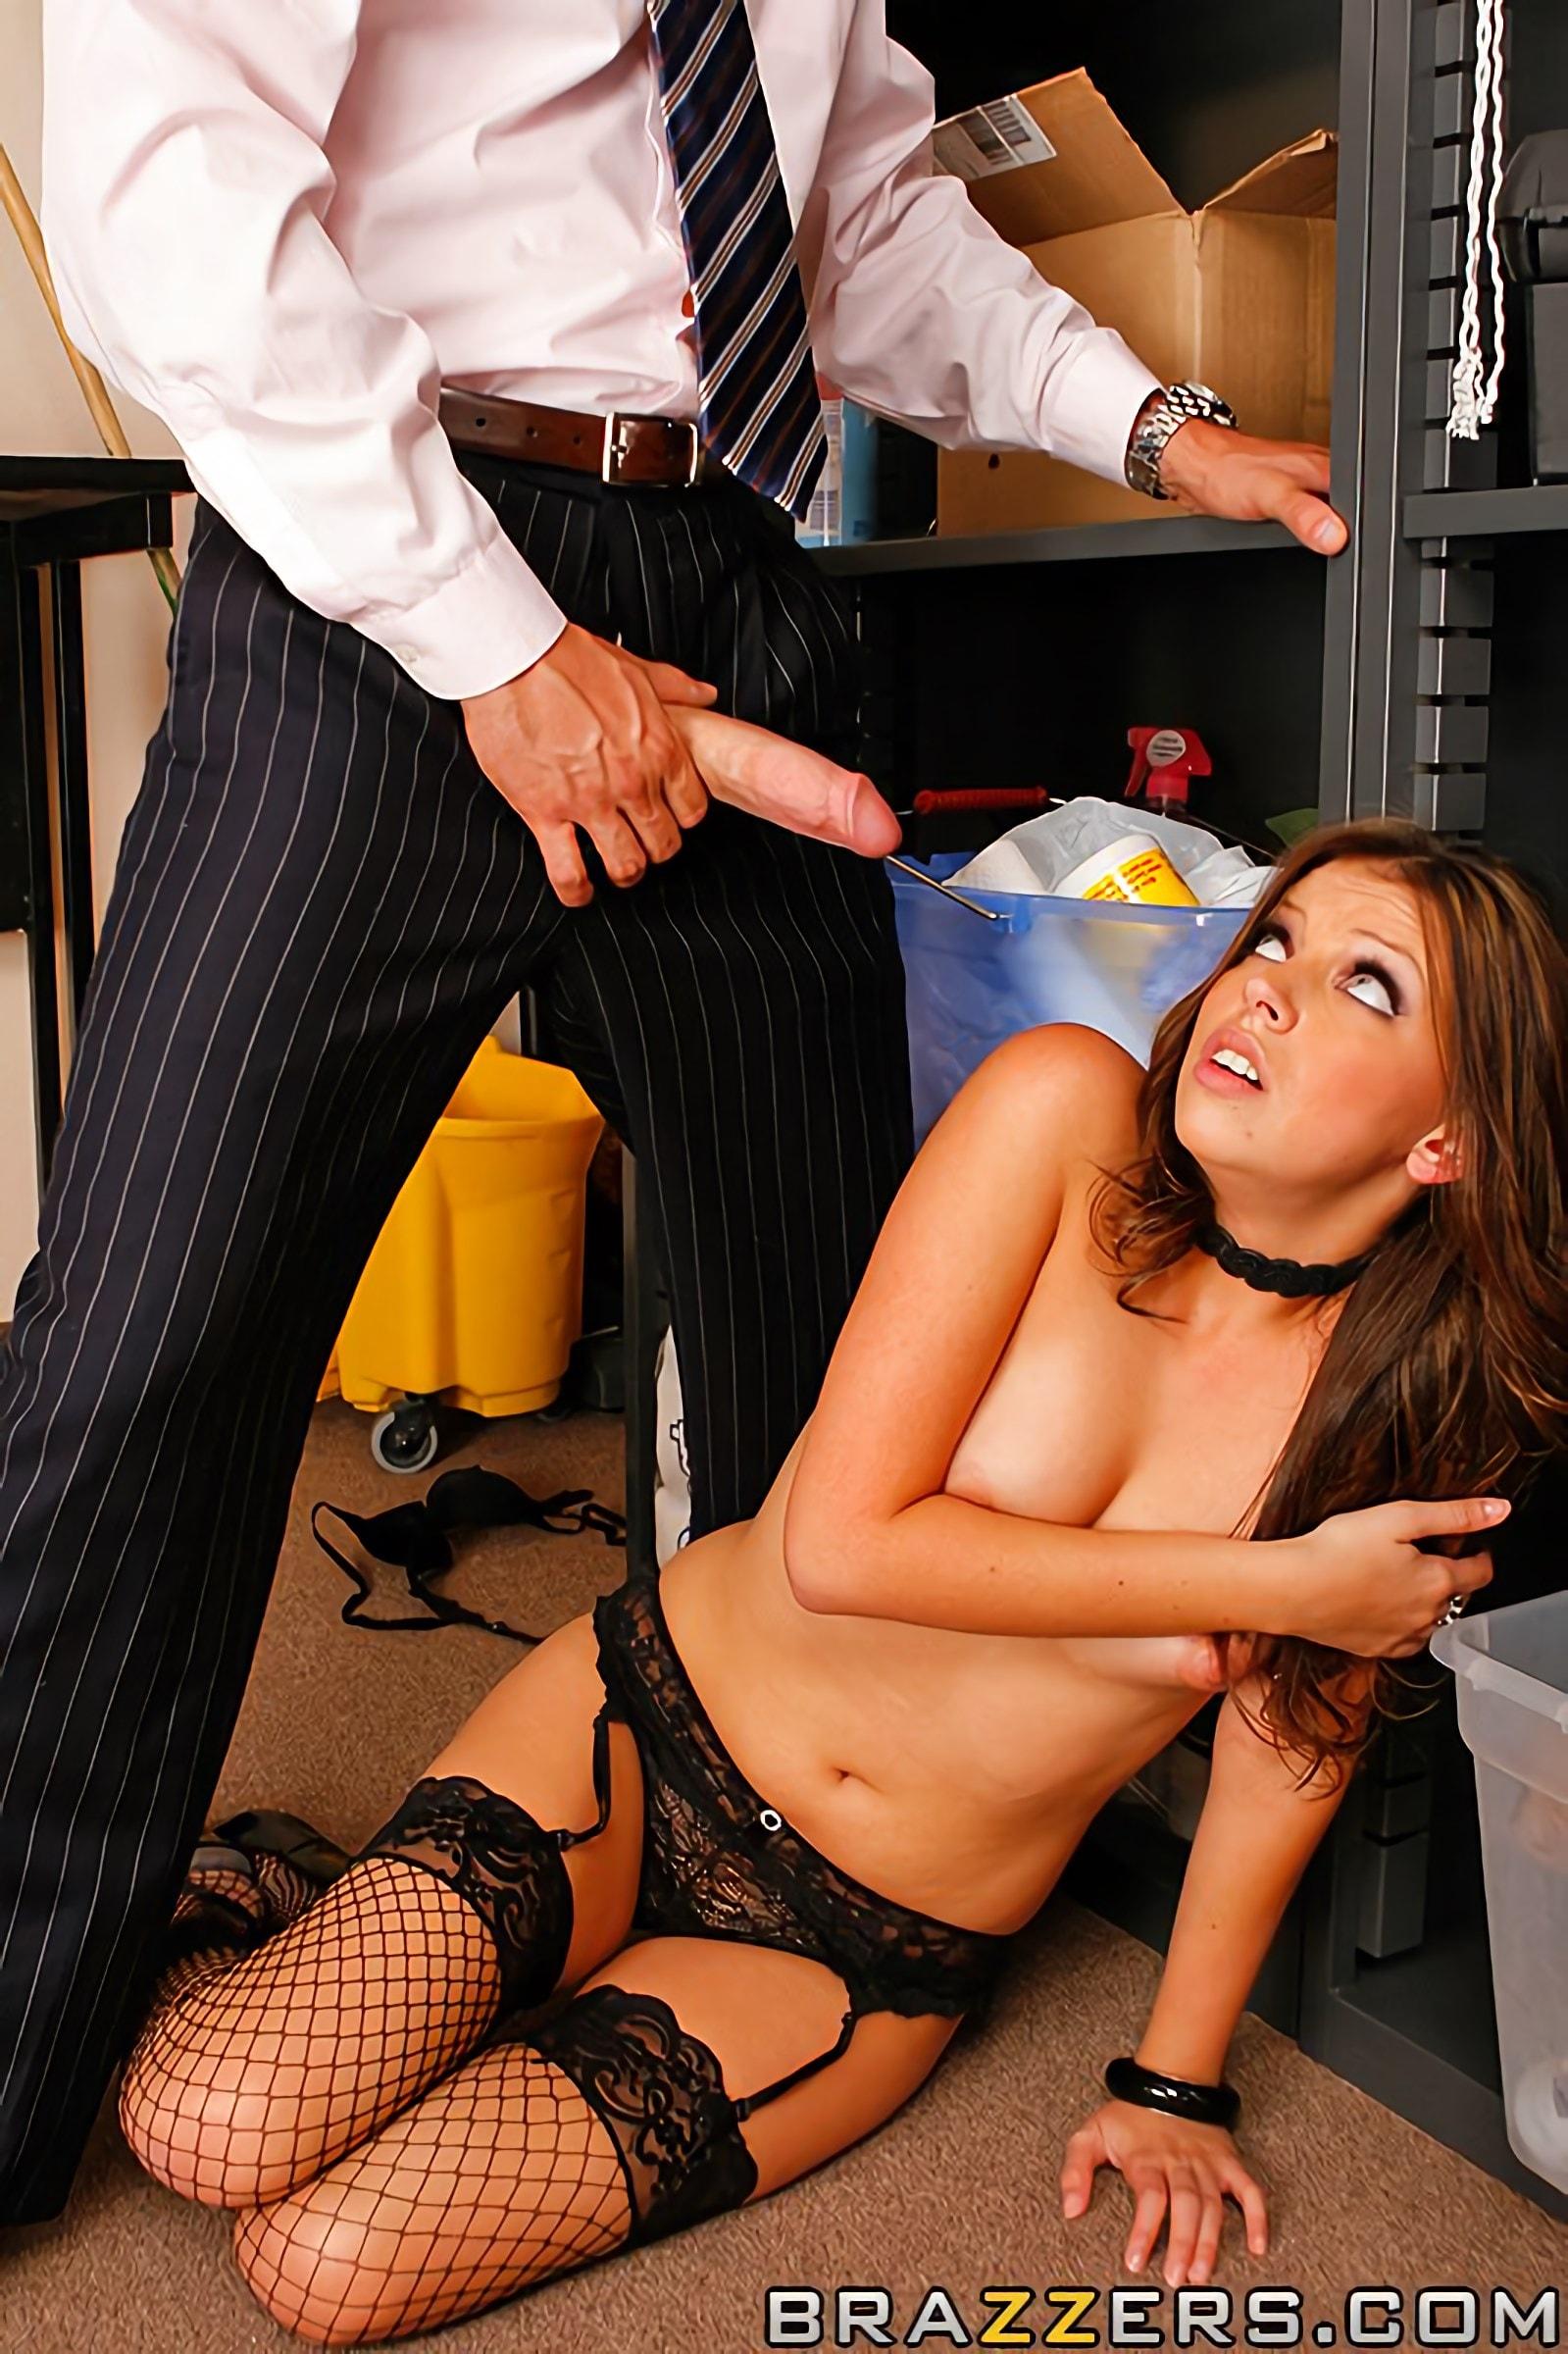 Секретаршу наказывает босс порно